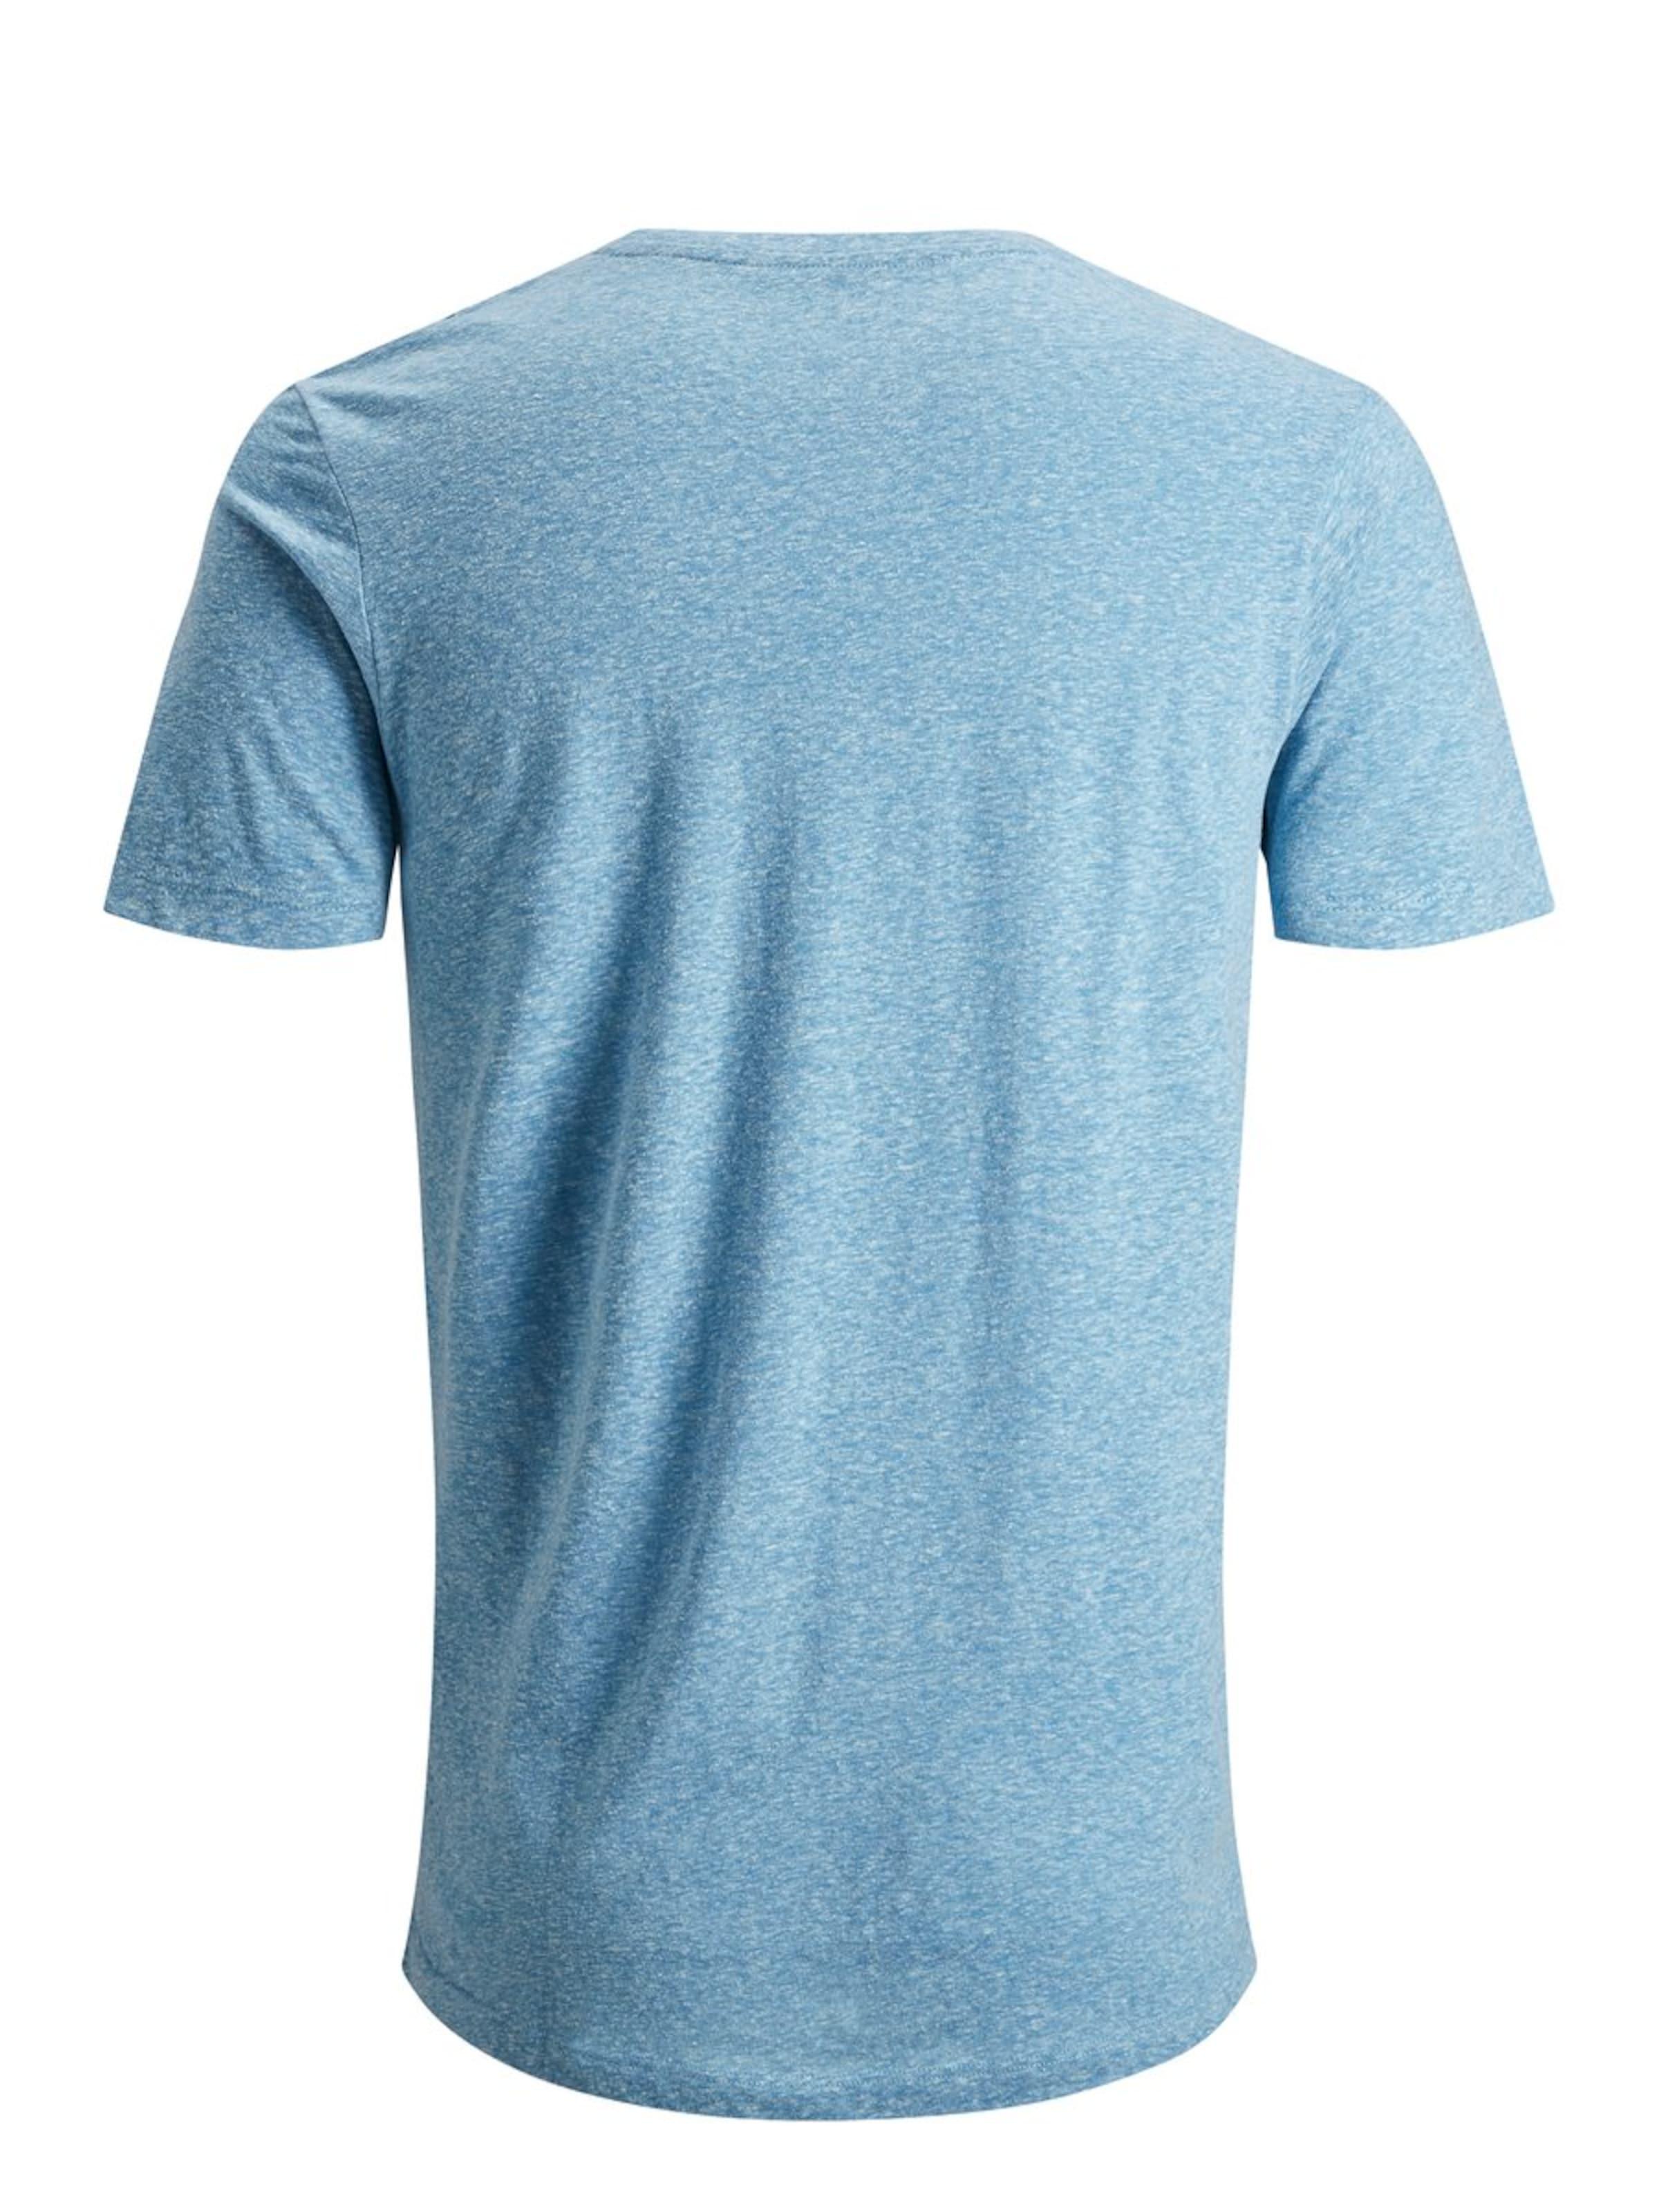 In Jackamp; T Jones Hellblau shirt Ee9W2YIDH